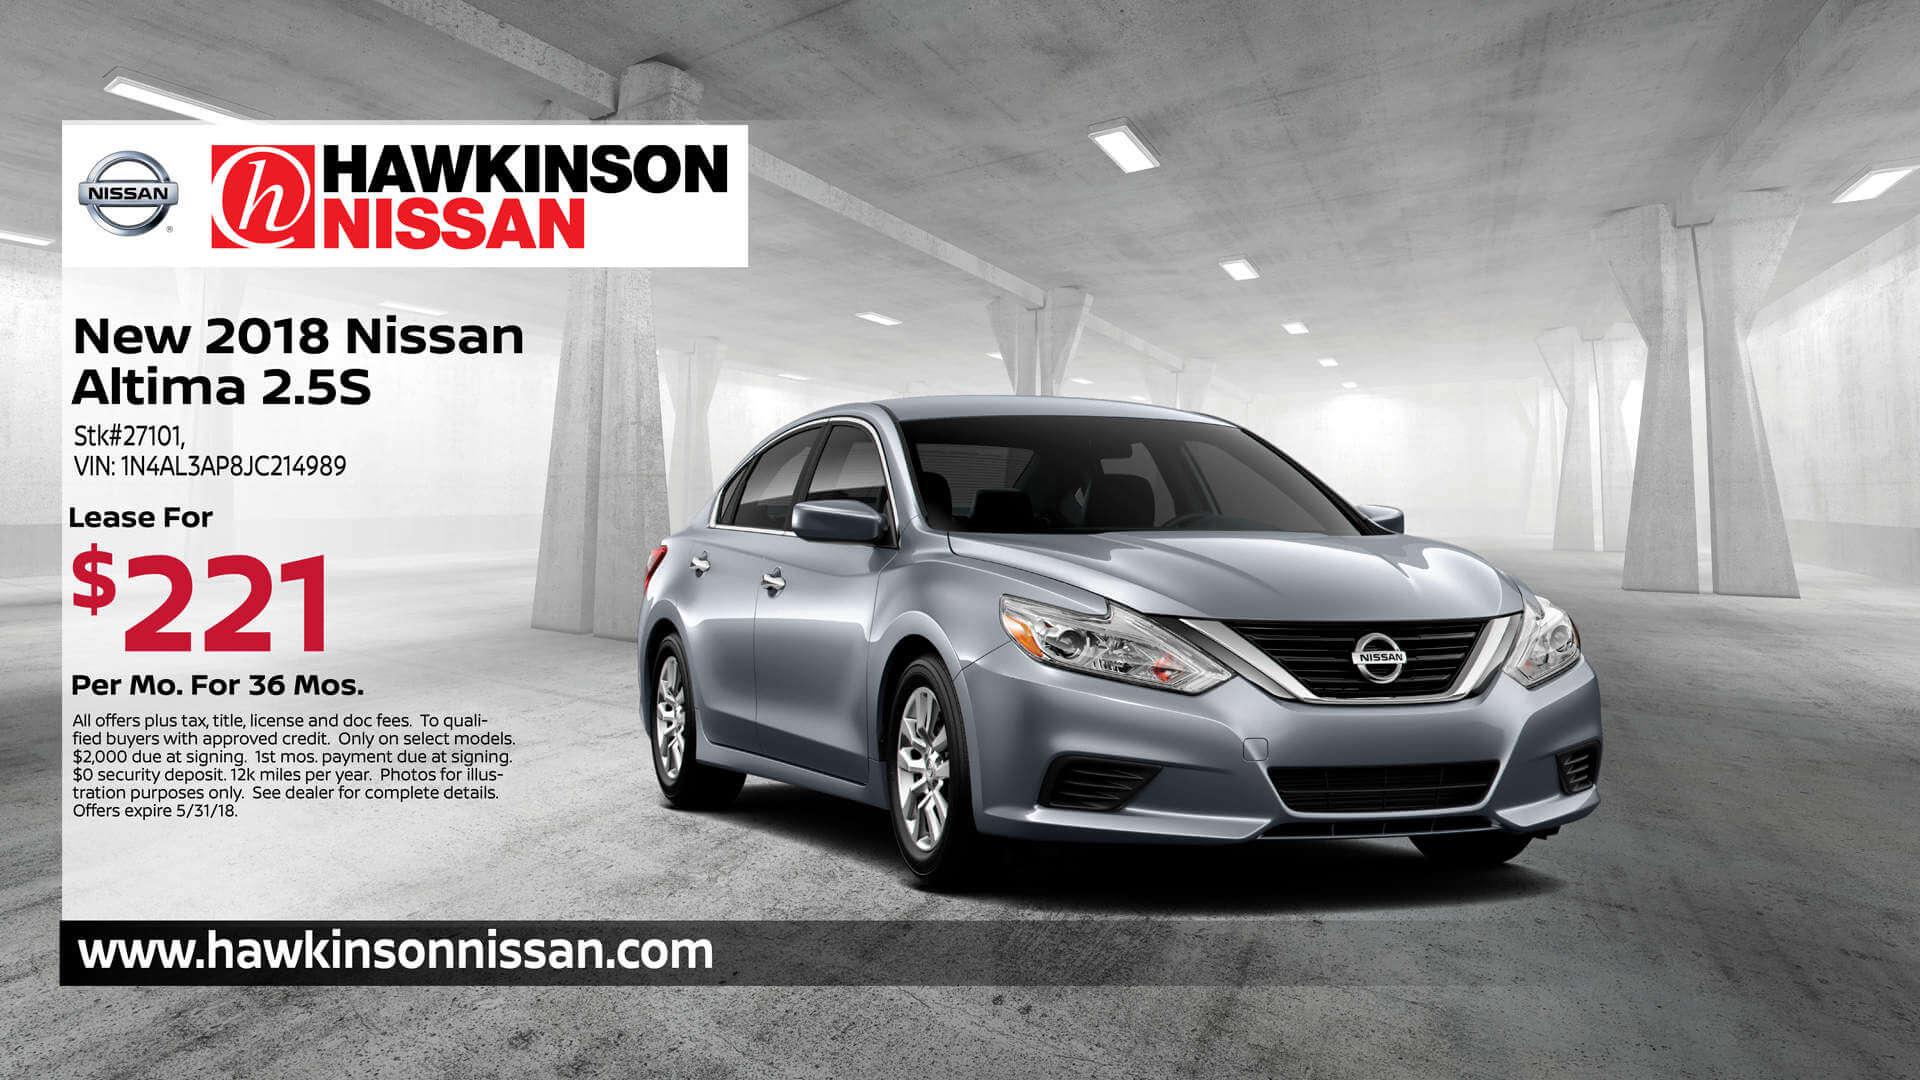 2017 Nissan Altima 2.5S